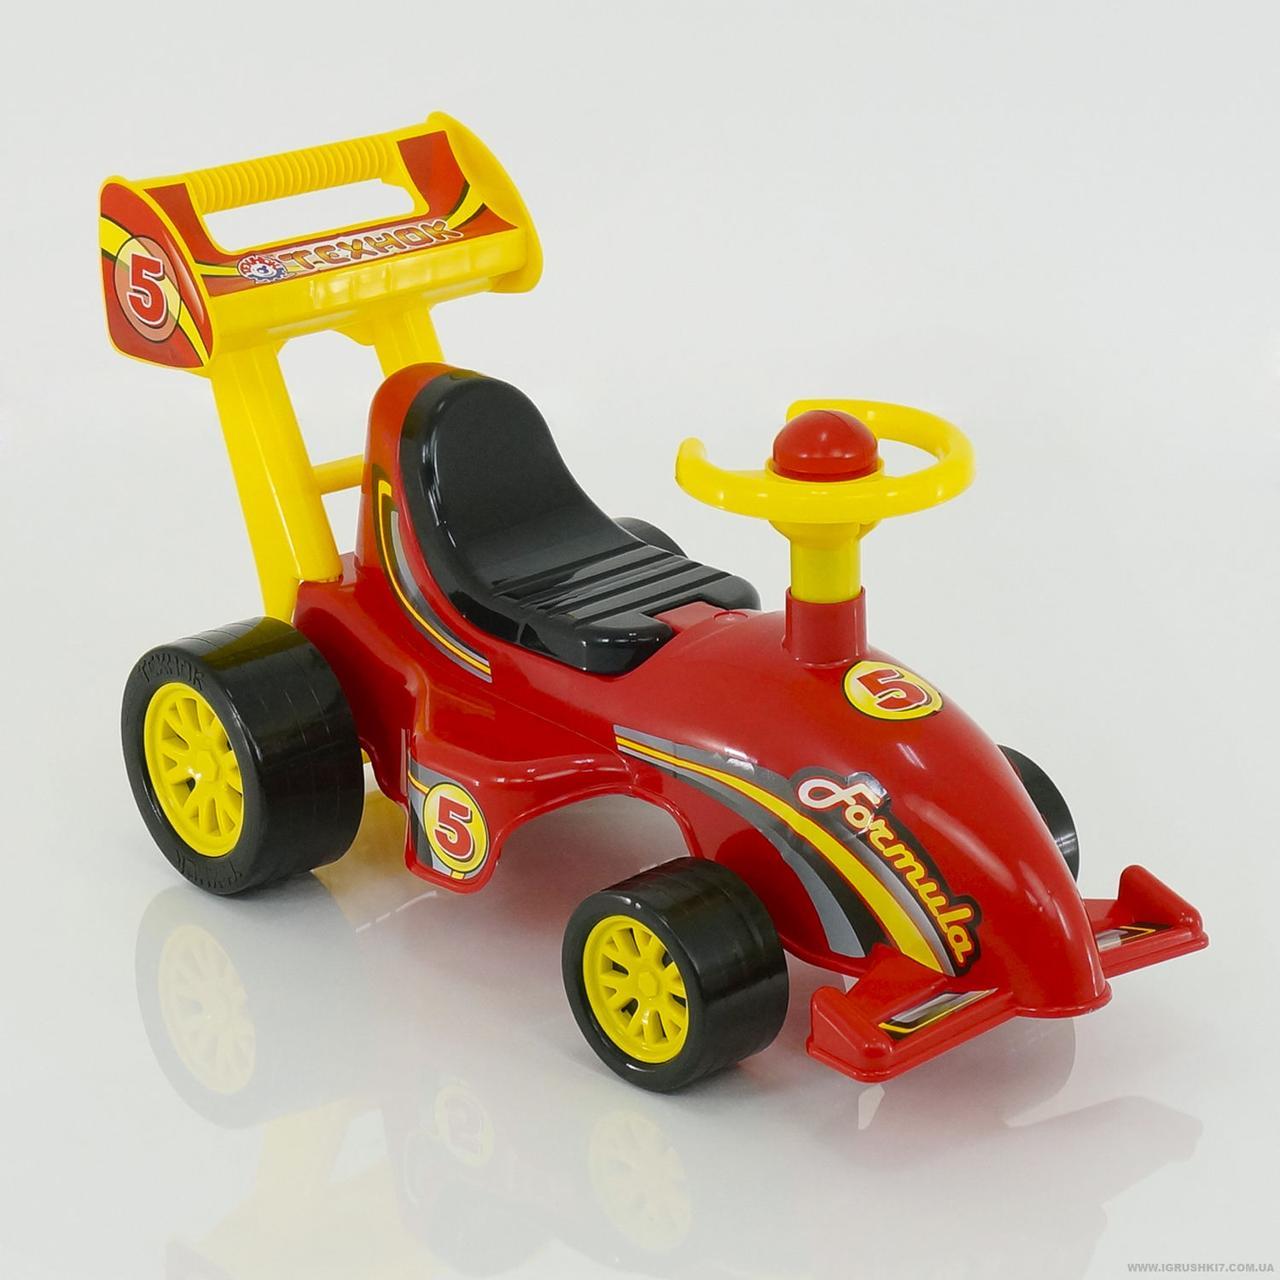 Беби машина каталка толокар ТЕХНОК Формула 3084 красный